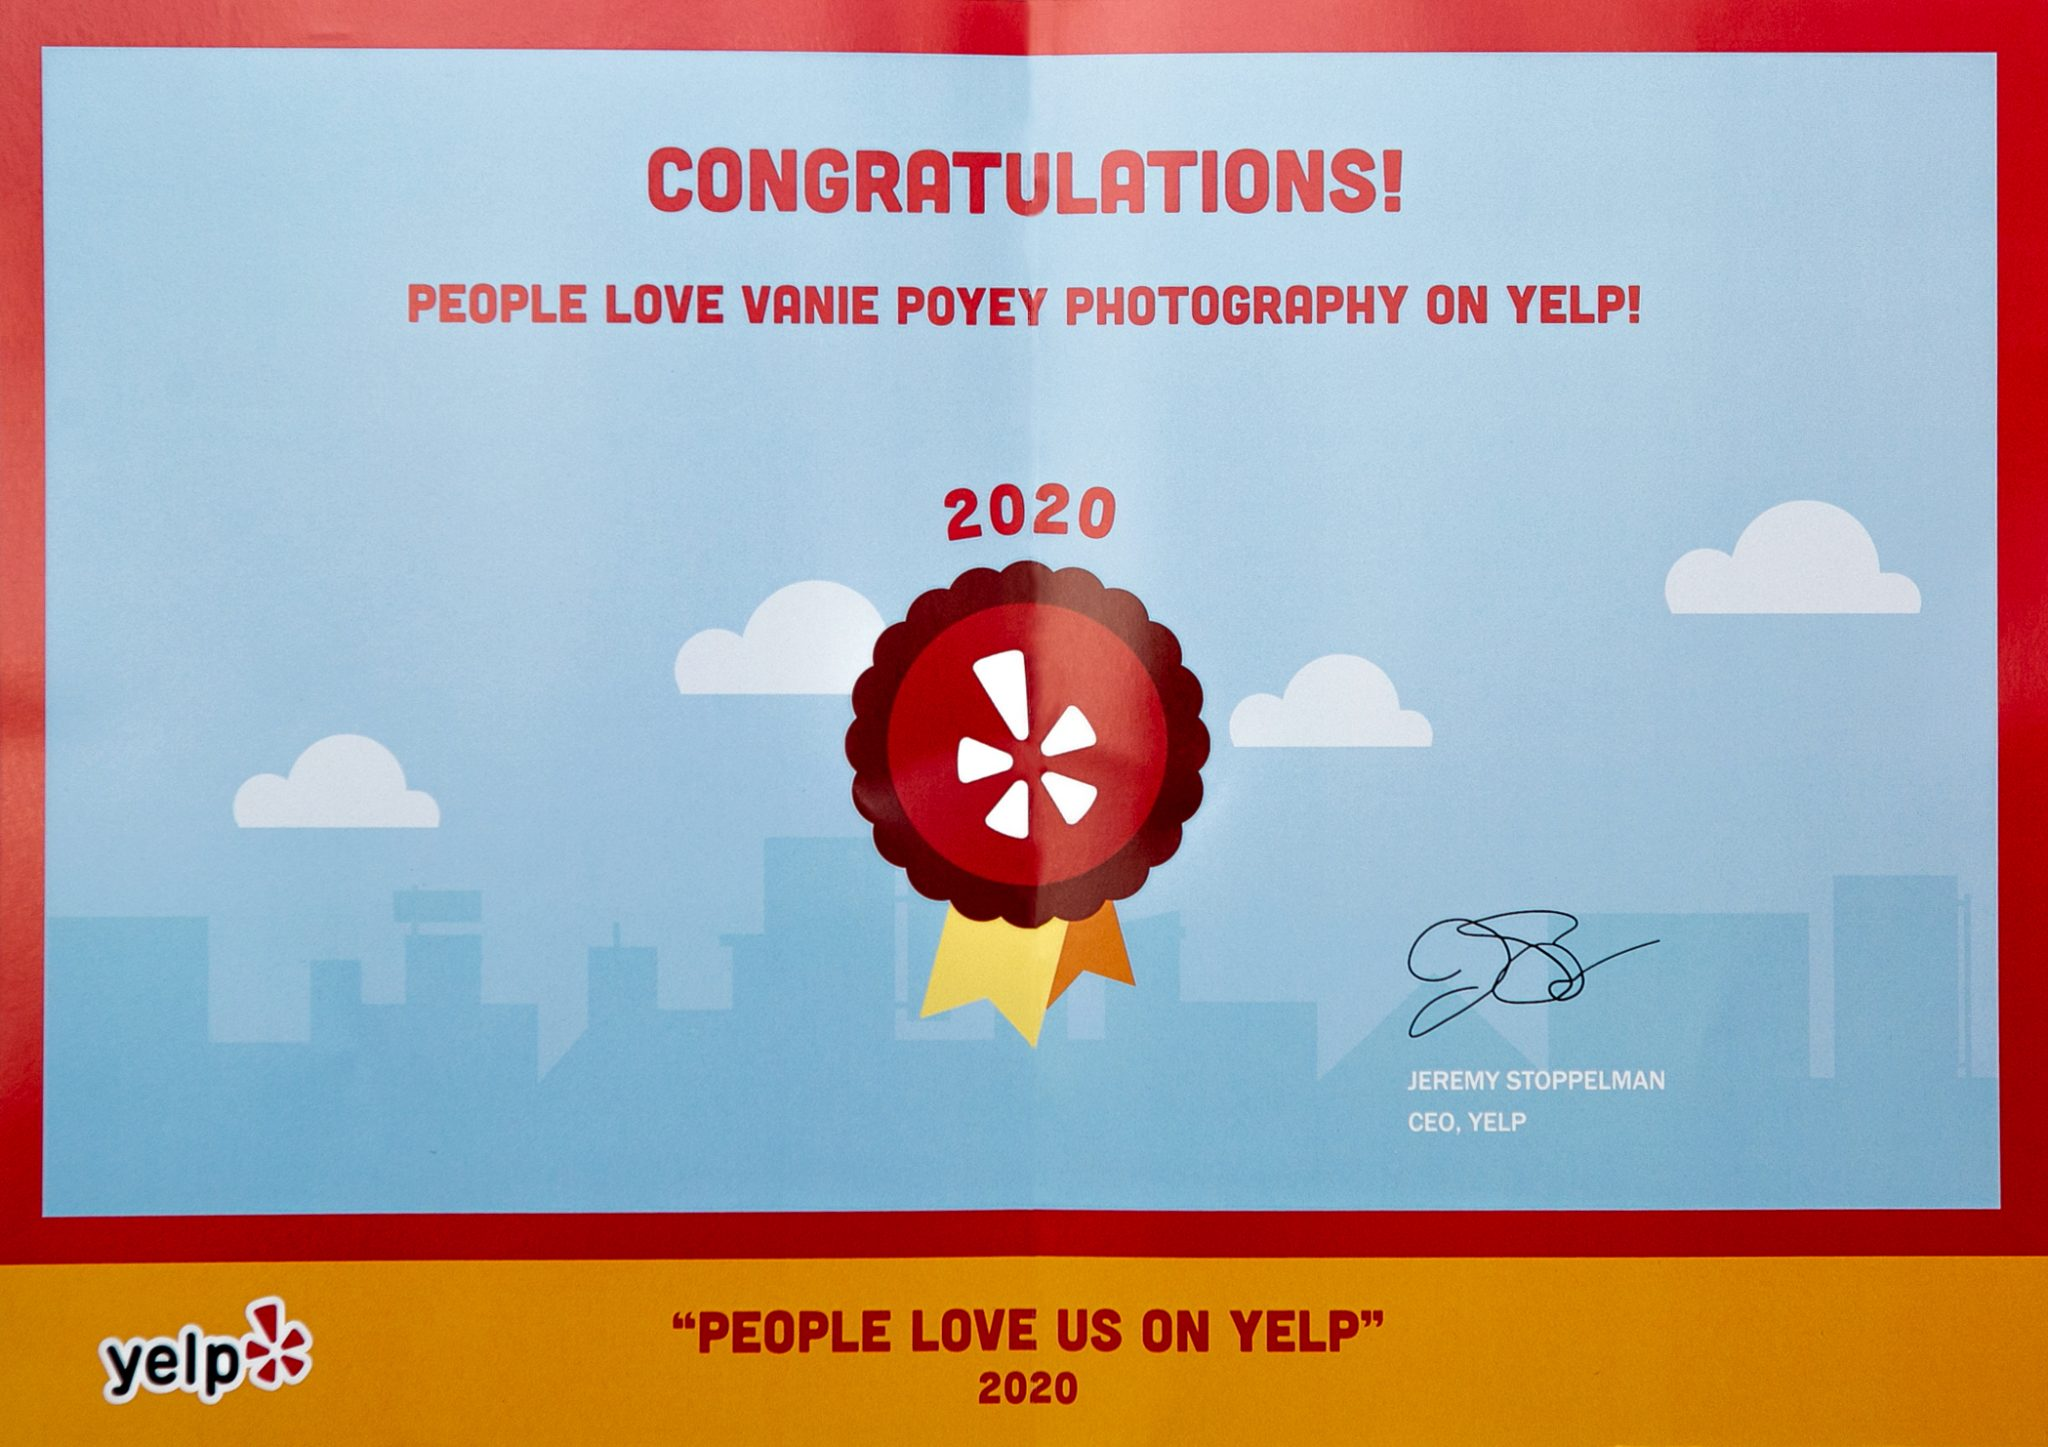 Vanie Poyey Yelp Reviews